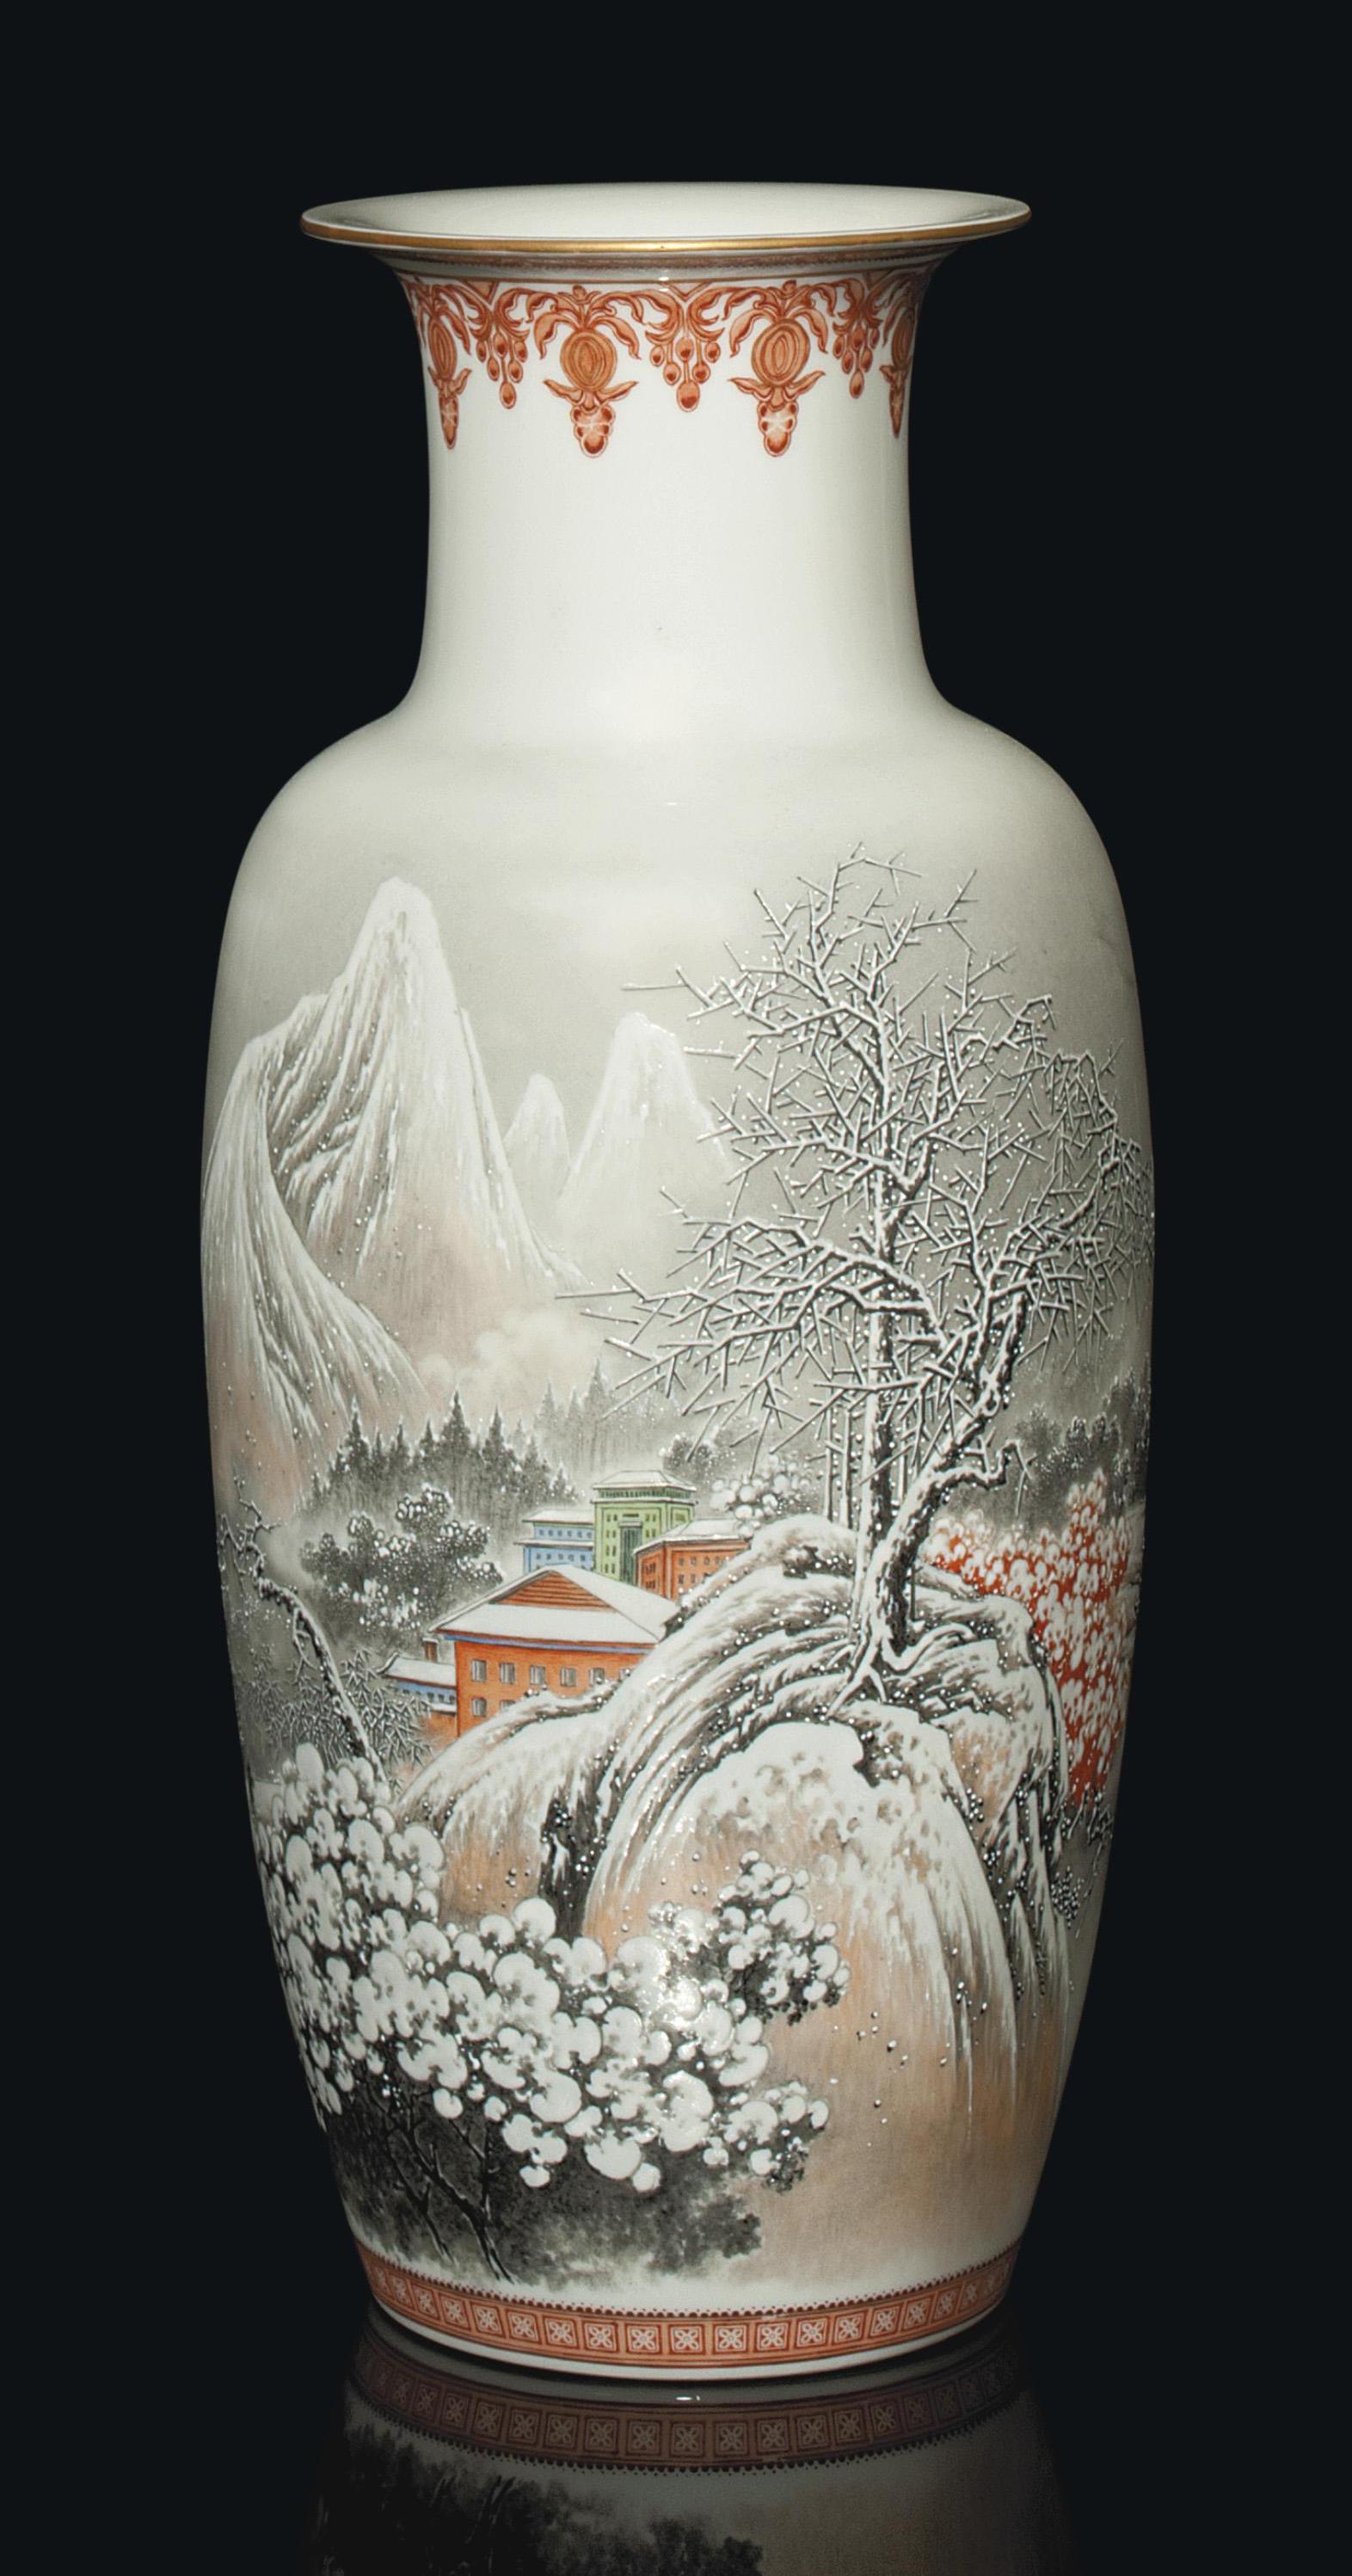 A CHINESE 'SNOW SCENE' VASE